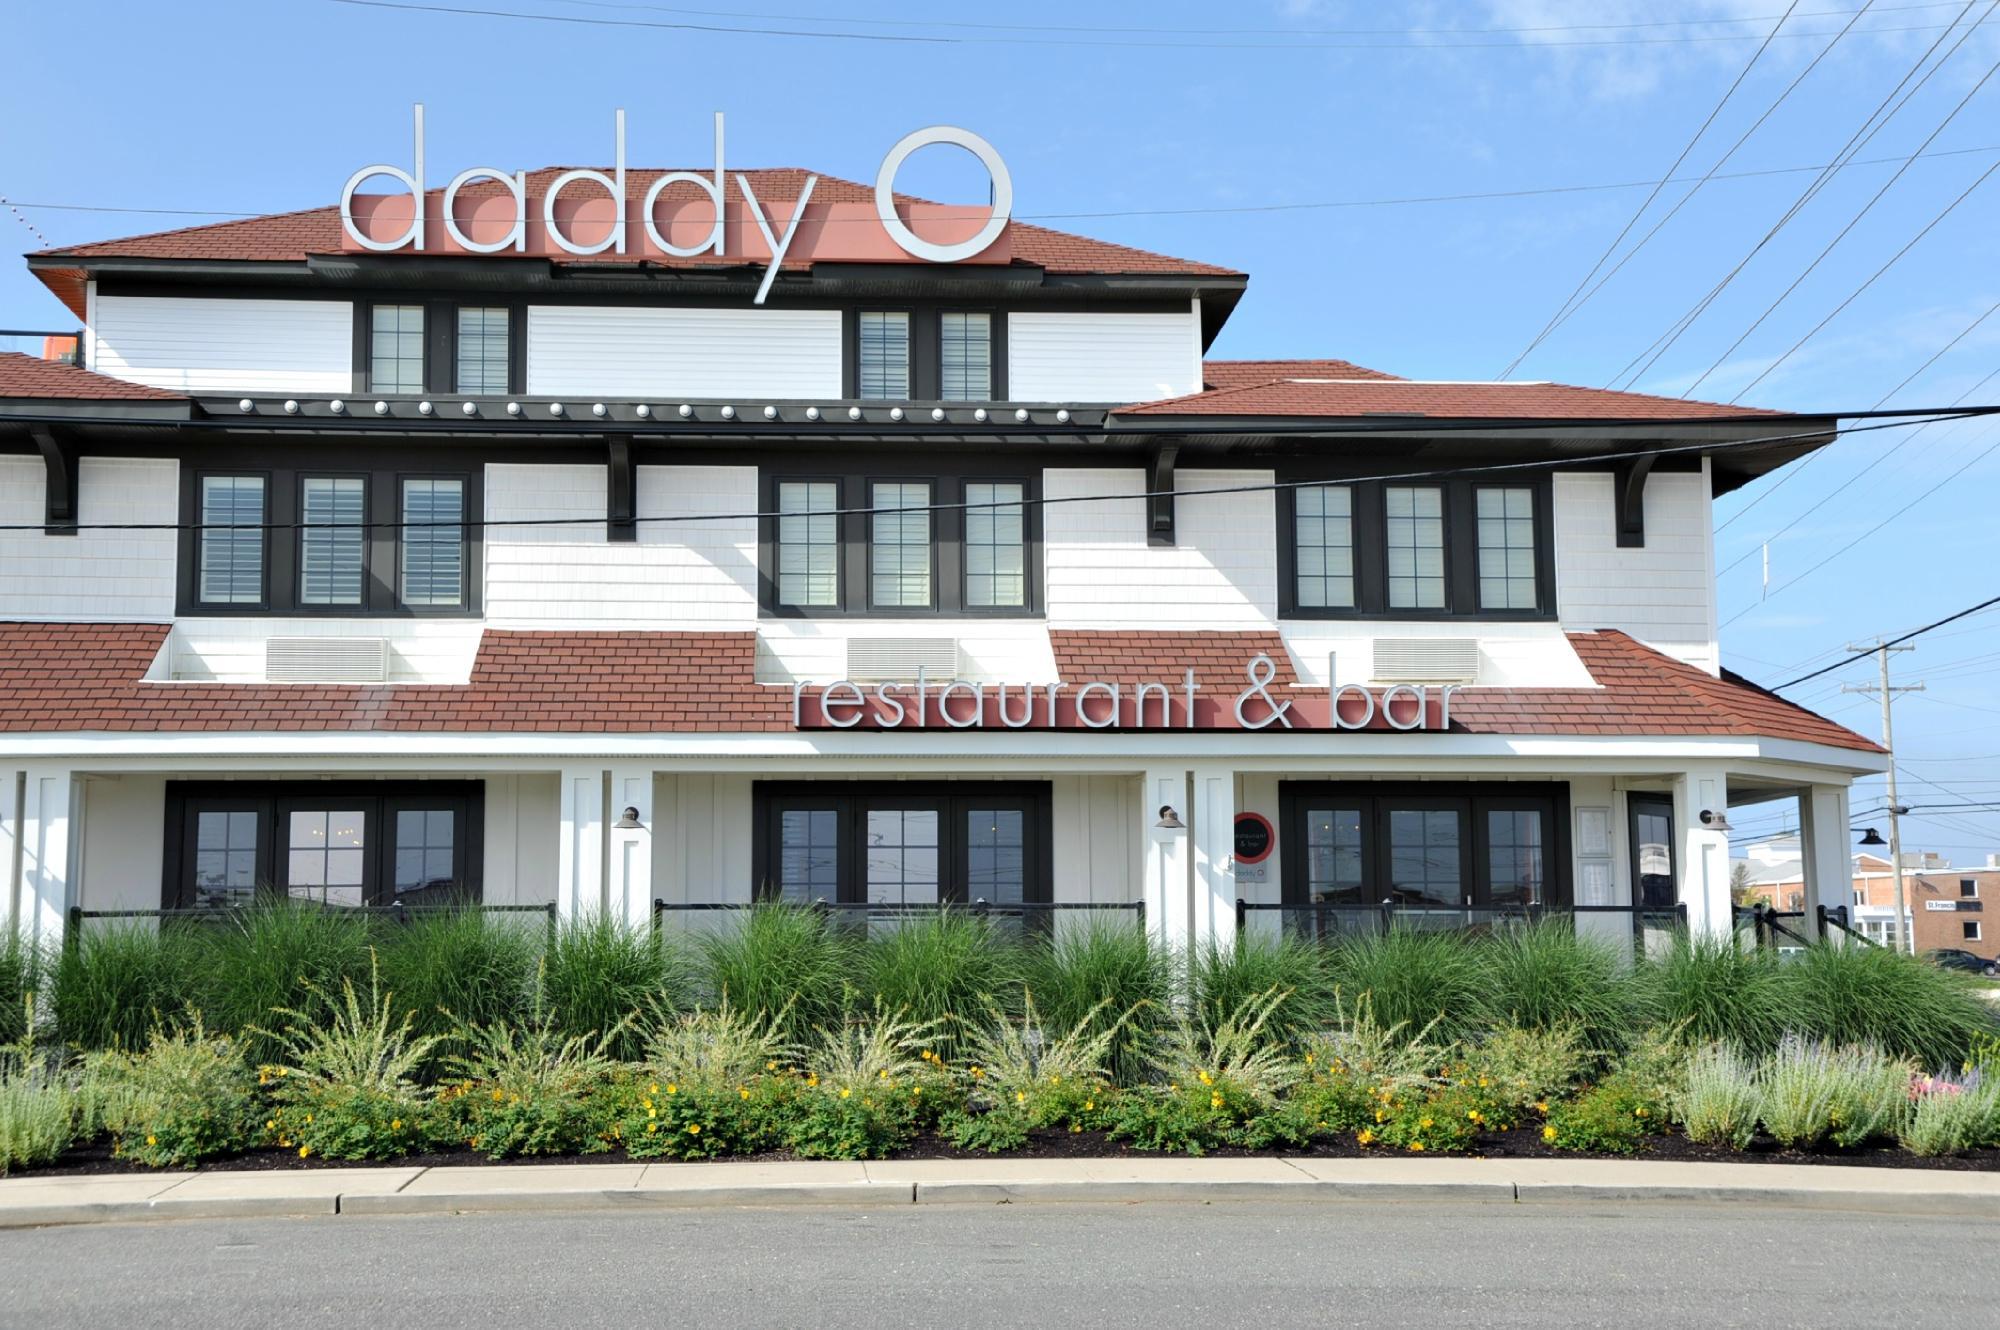 Daddy O Hotel and Restaurant